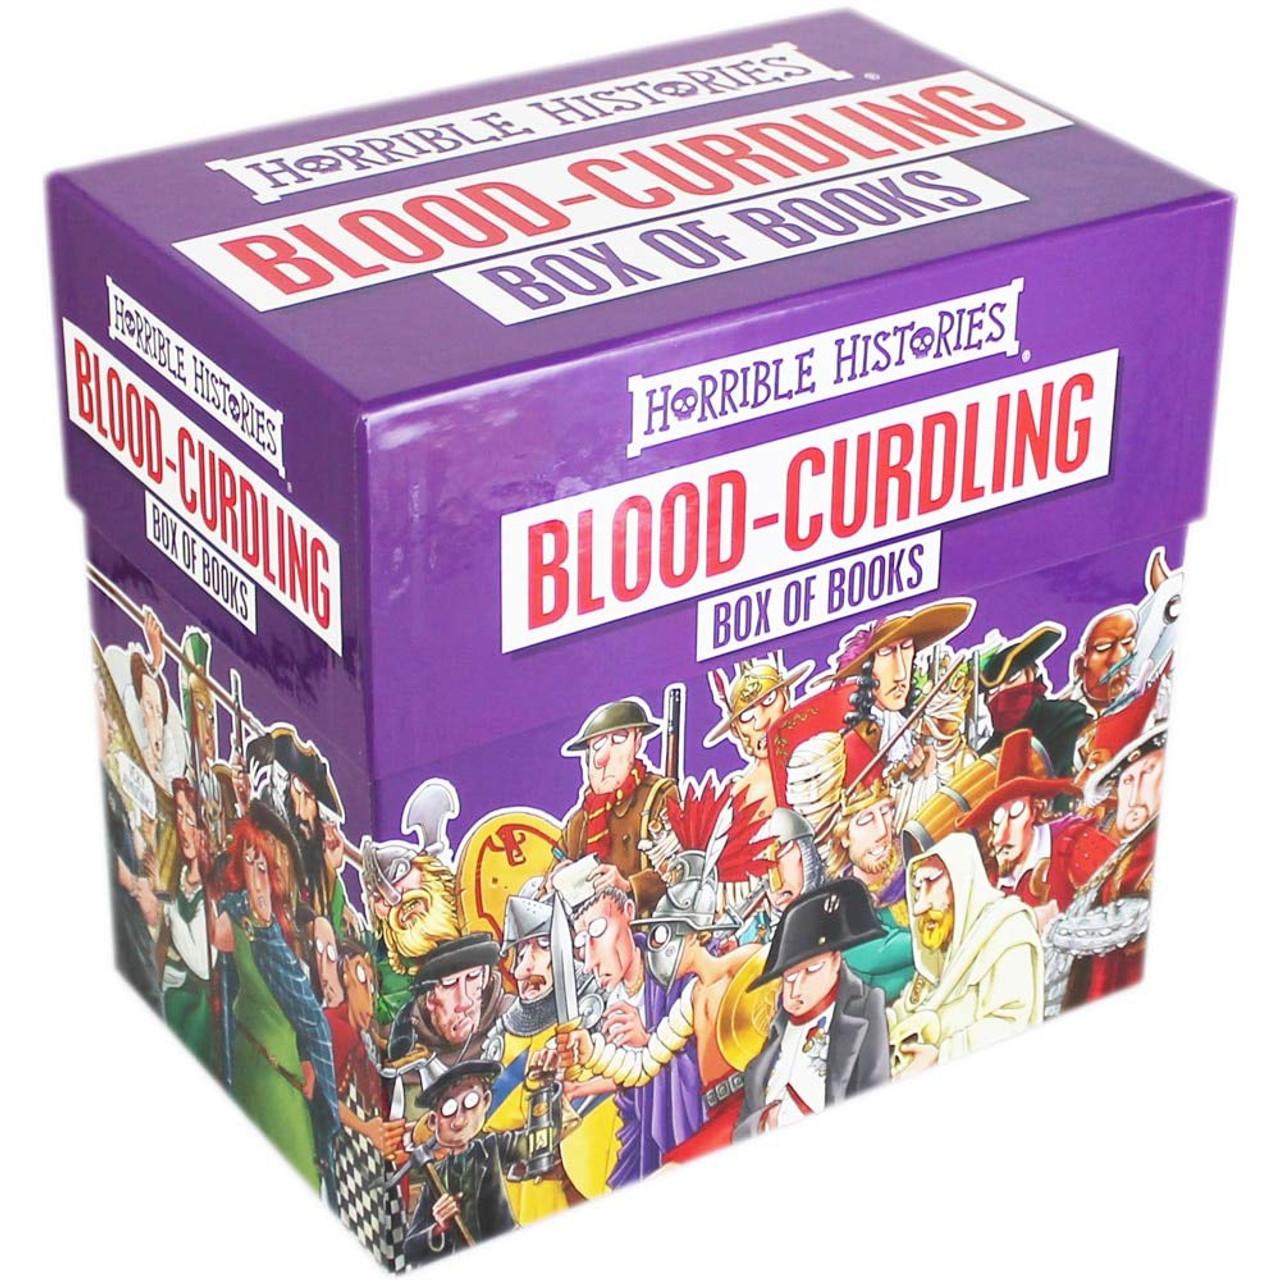 HORRIBLE HISTORIES BLOOD-CURDLING BOXSET (20 BOOKS) W1